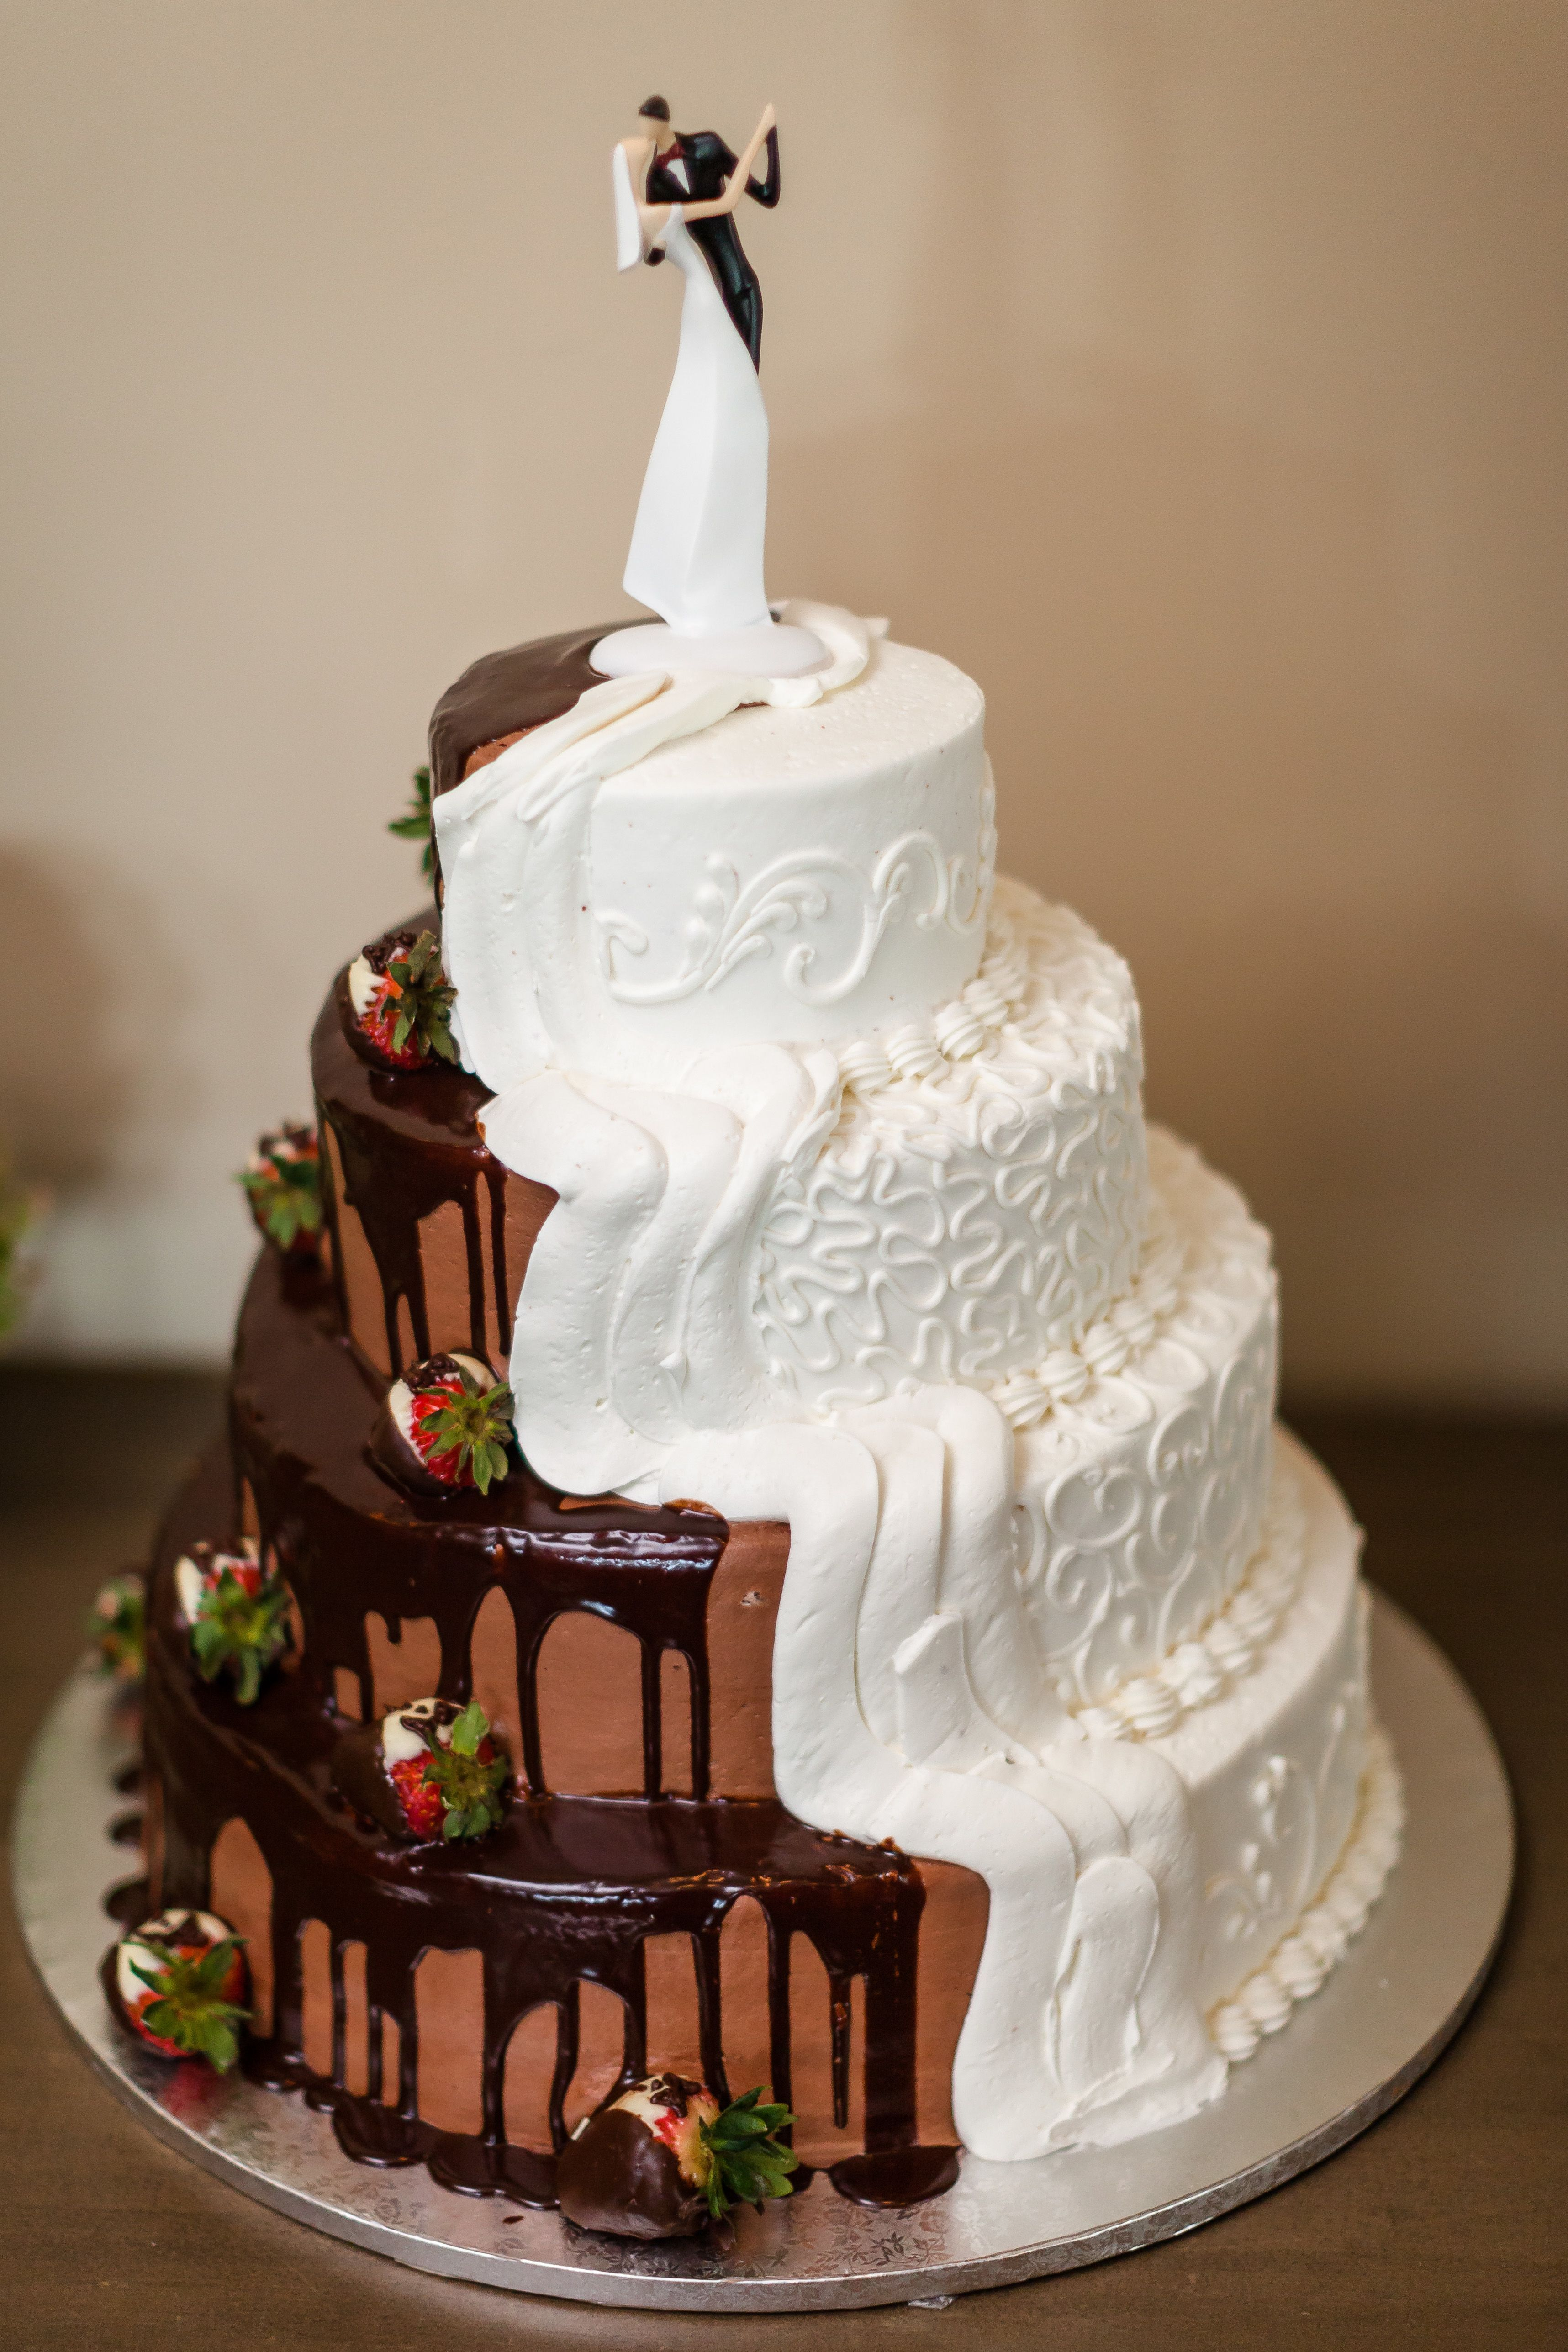 Combined Chocolate and Vanilla Bride and Groom's Cake #birthday cake #bride #cake #cake decorating #cake recipes #chocolate #Combined #gateau anniversaire #gateau chocolat #gateau de paques #Grooms #Vanilla #wedding cakes #wedding ideas